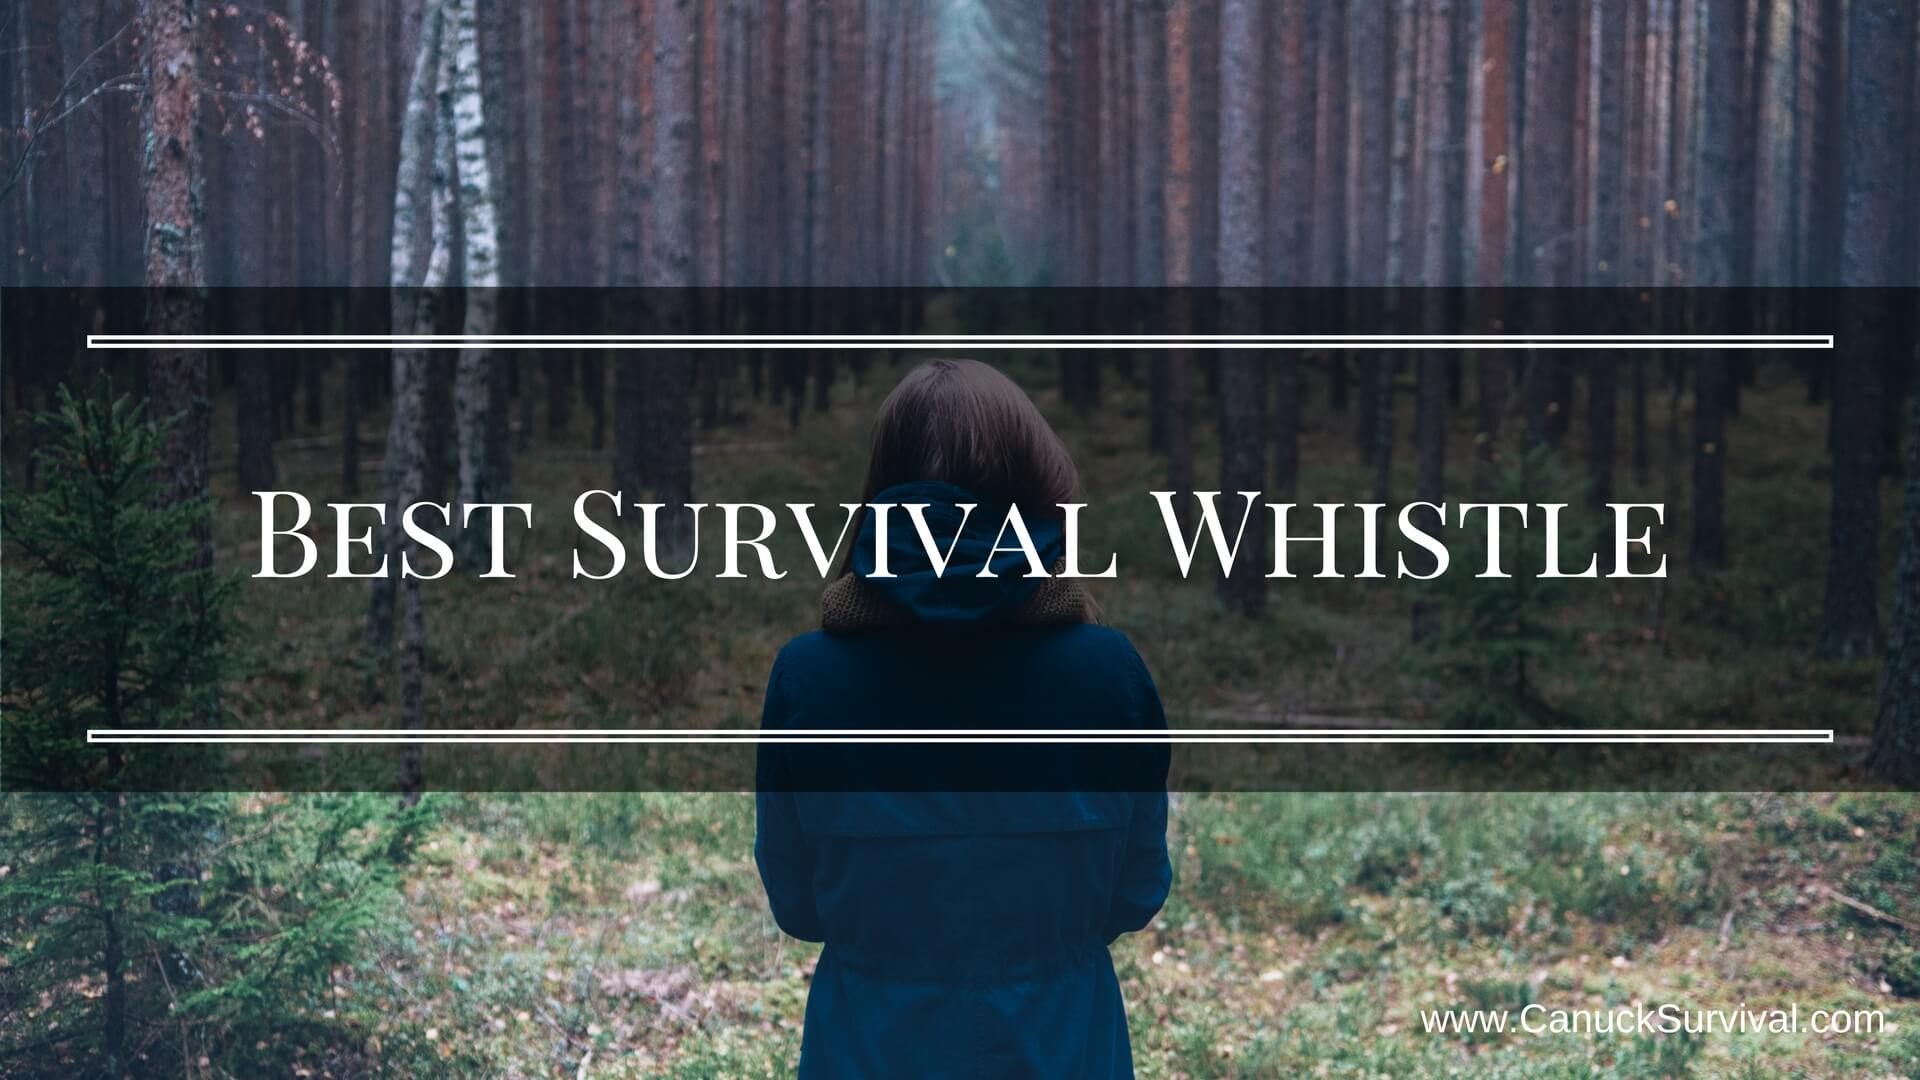 Best Survival Whistle